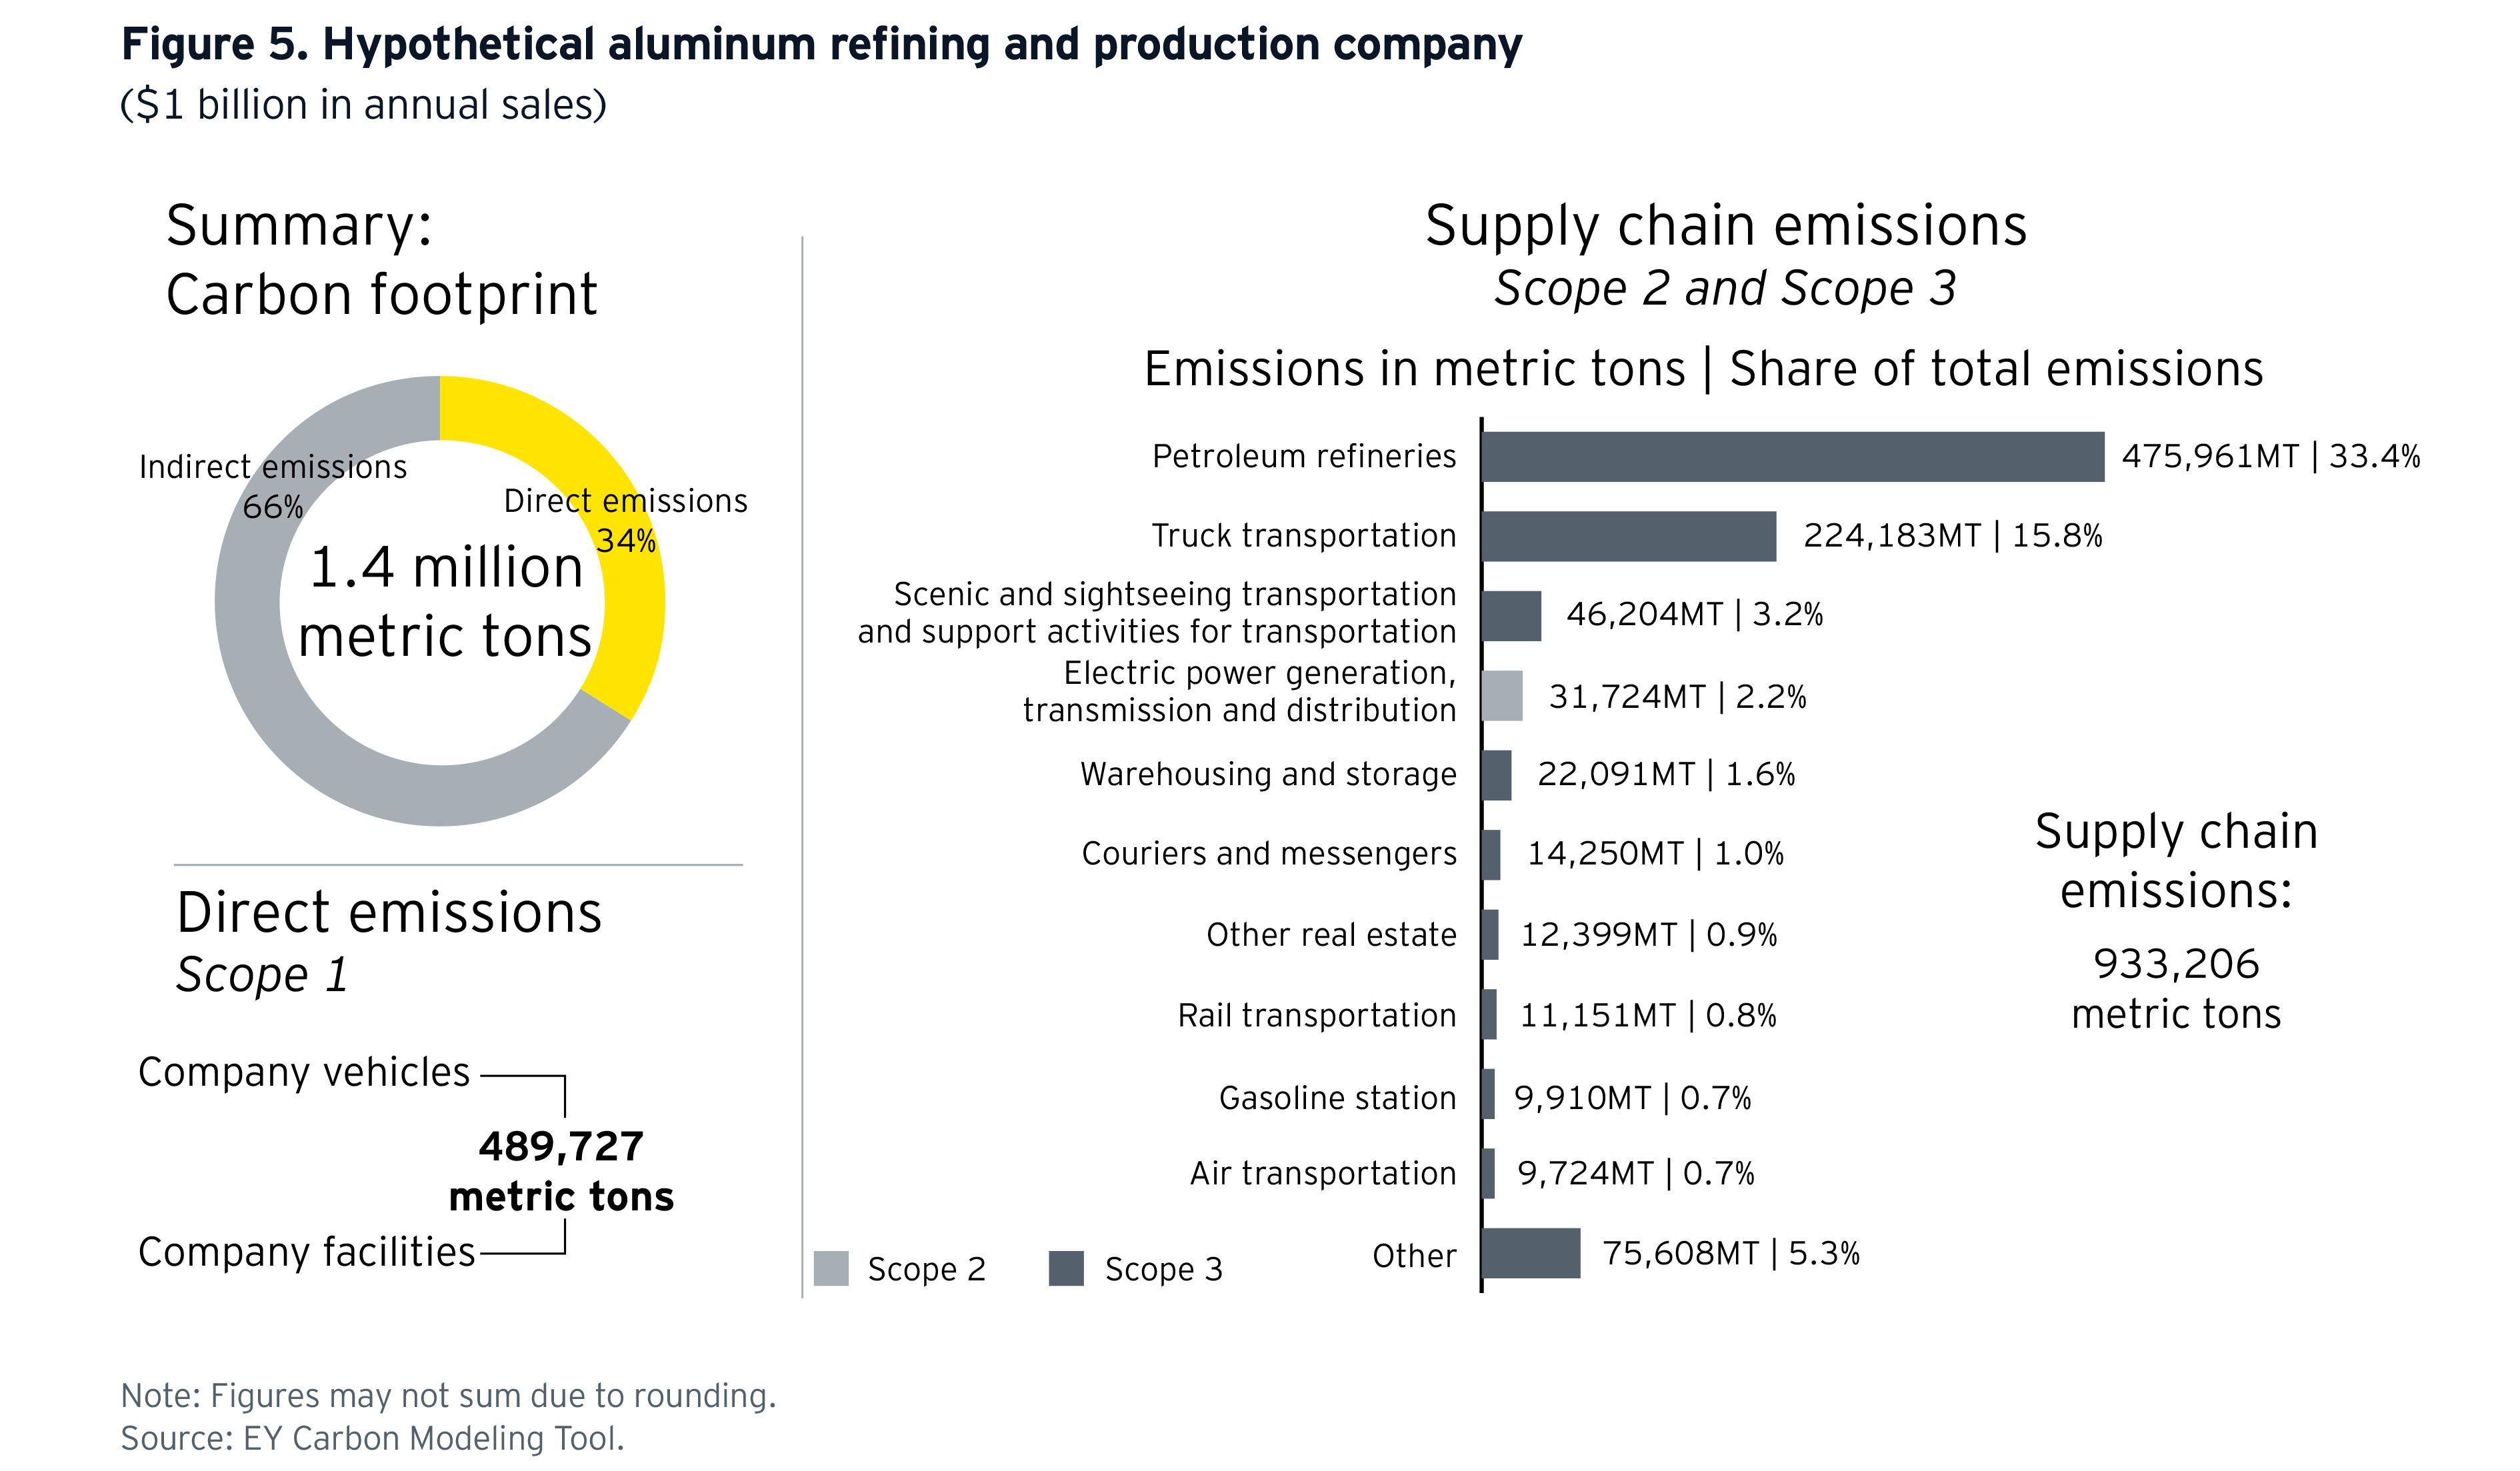 ey-hypothetical-aluminum-refining